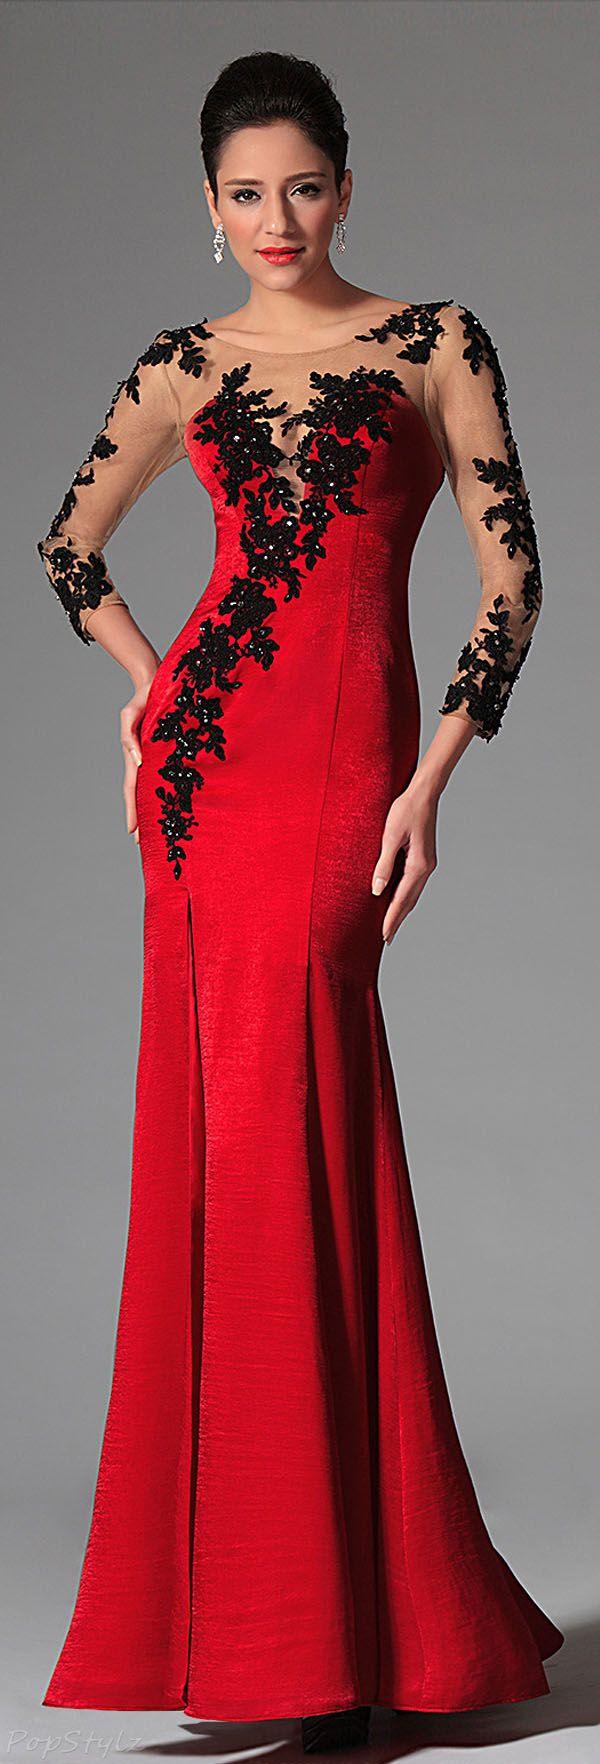 Edressit lacy velvet evening gown vestido coctel pinterest